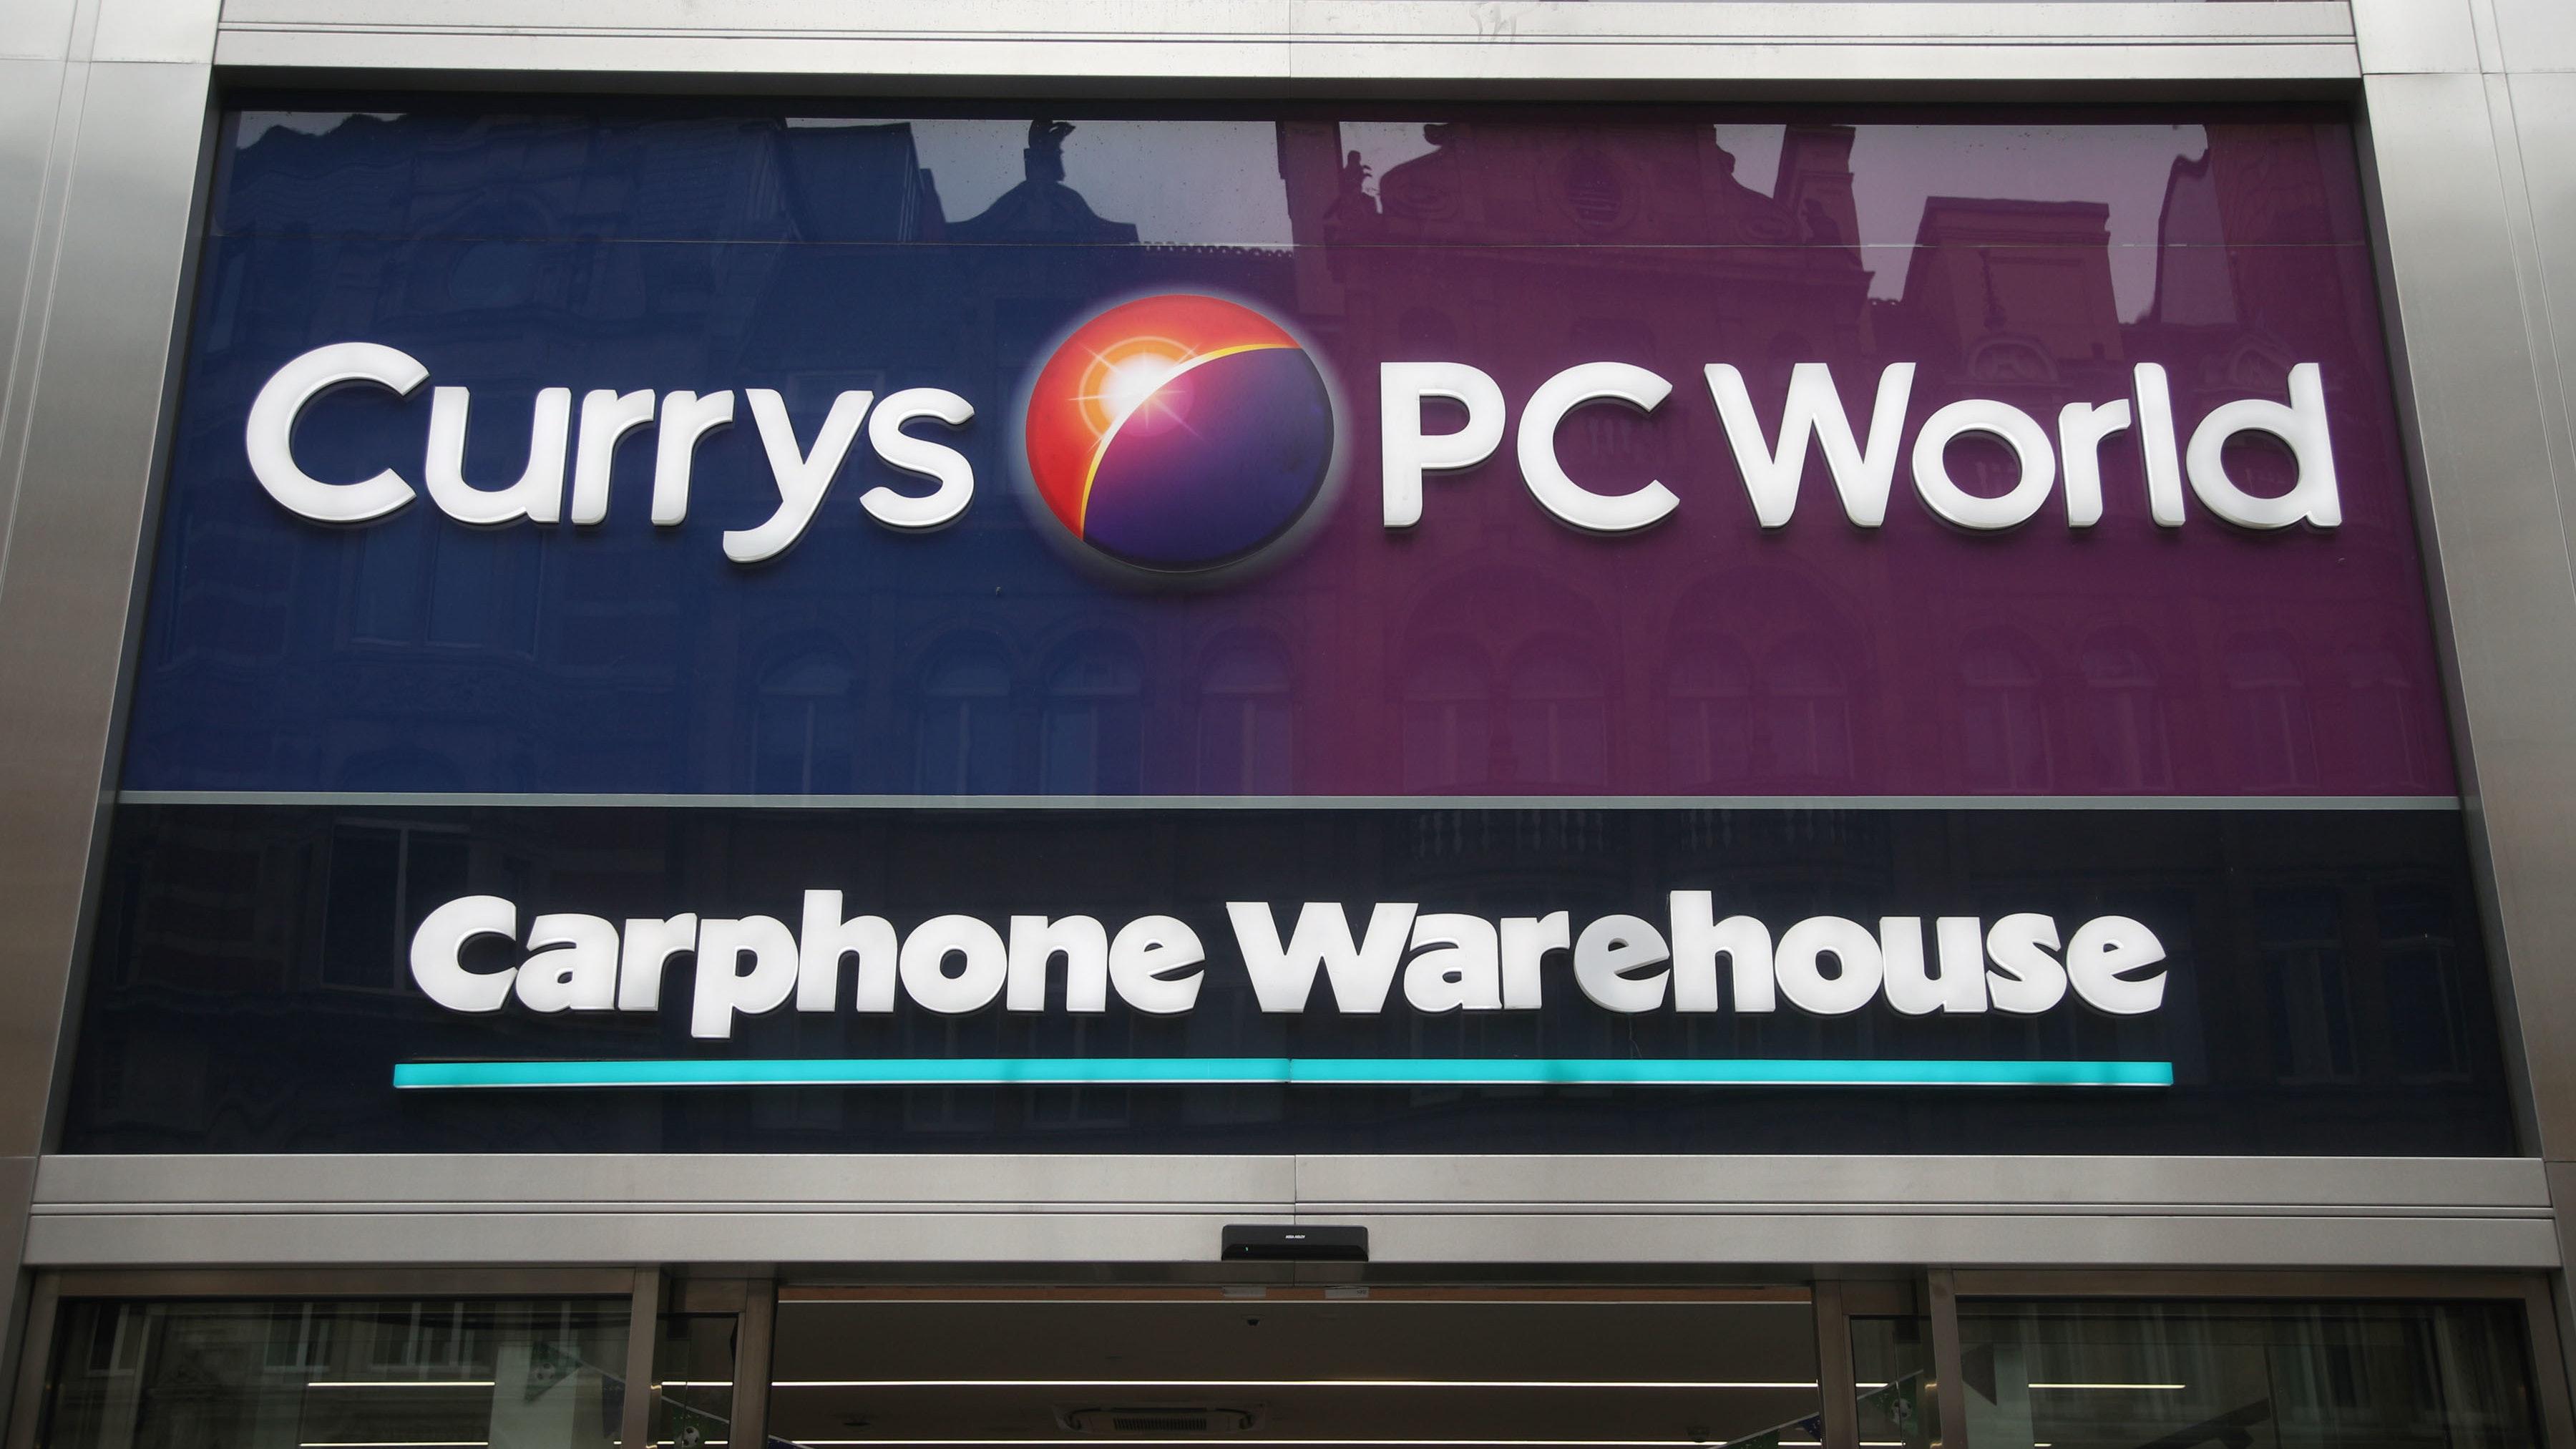 Dixons Carphone posts profits plunge in wake of major cyber